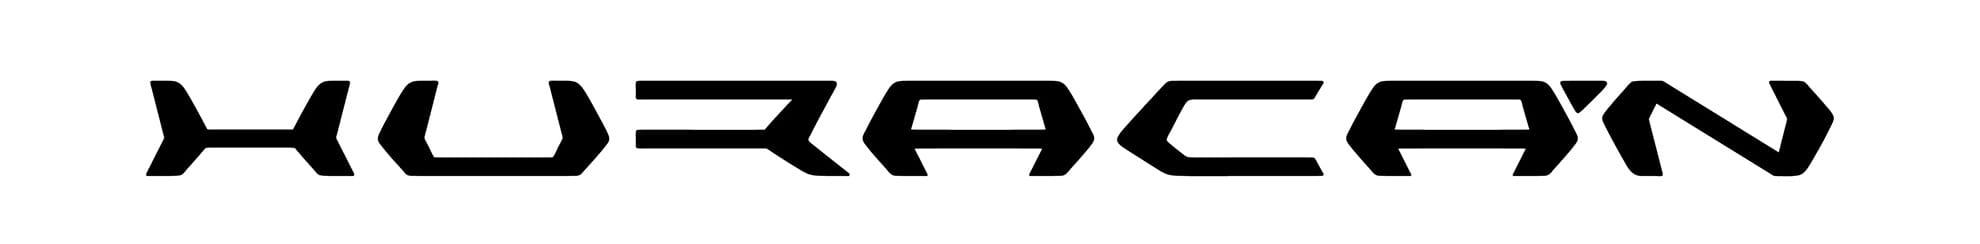 Lamborghini Huracan Spyder Logo | About of logos